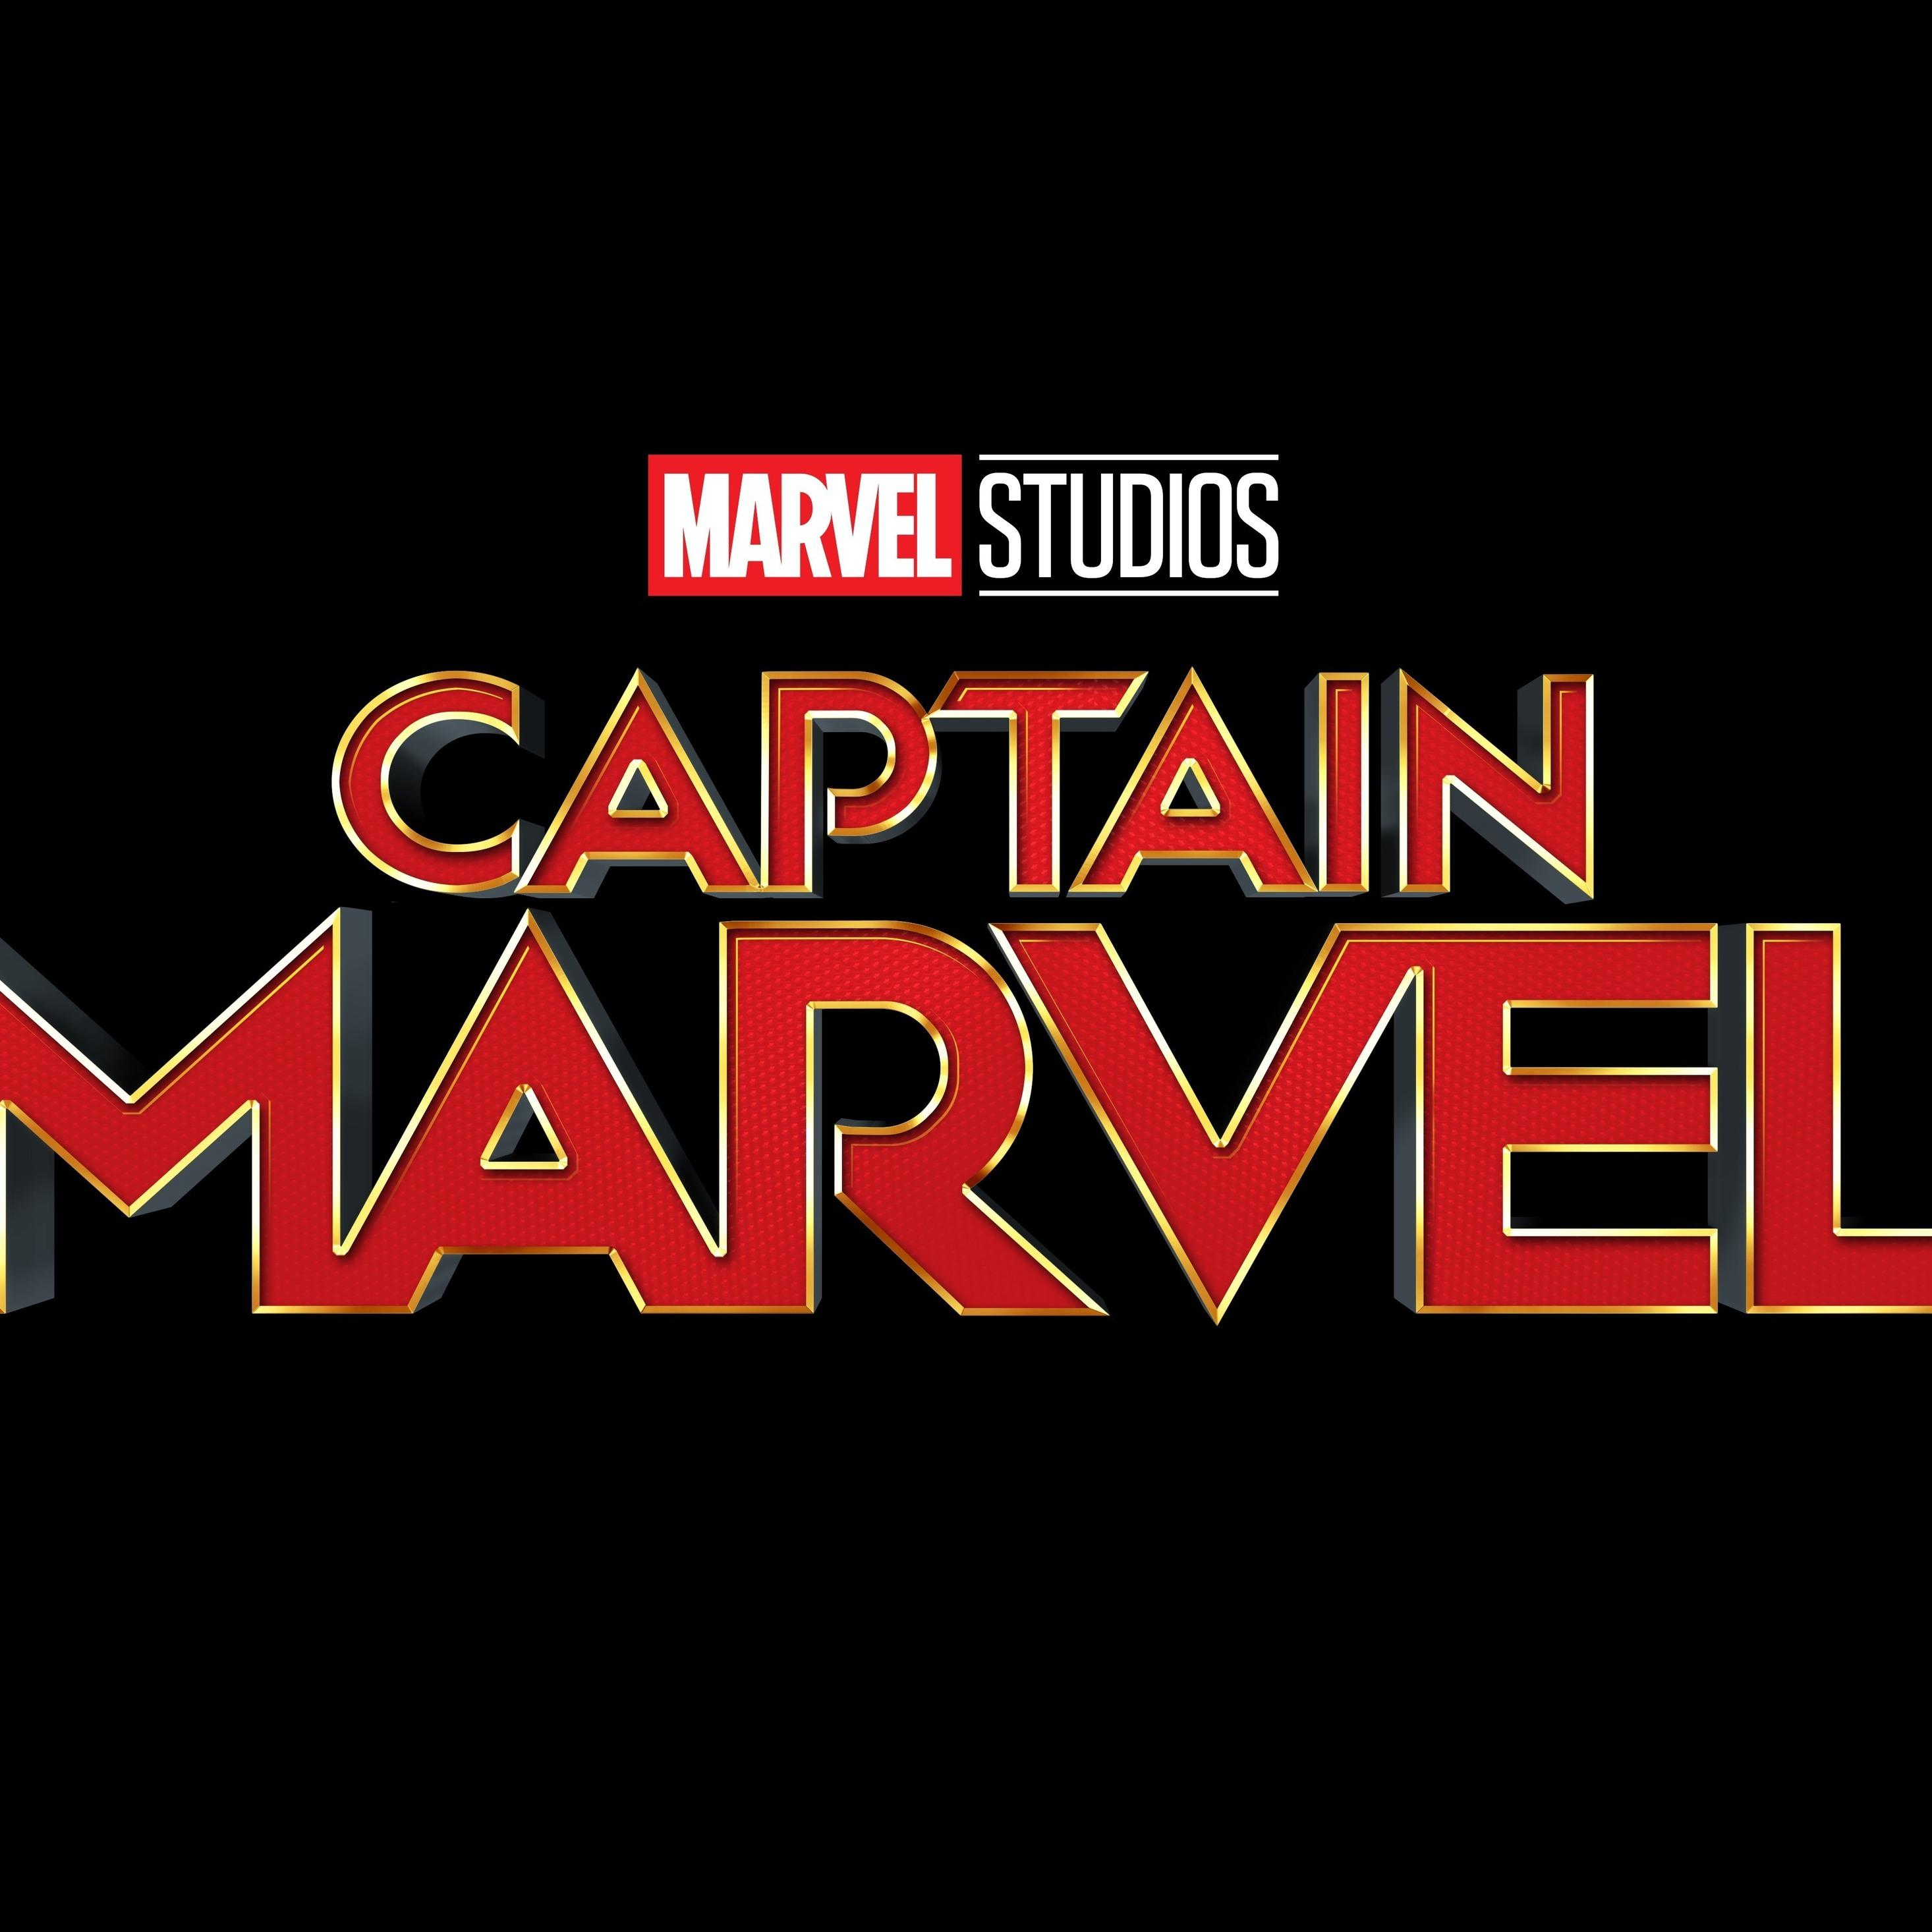 captain-marvel-movie-2019-5k-logo-75.jpg